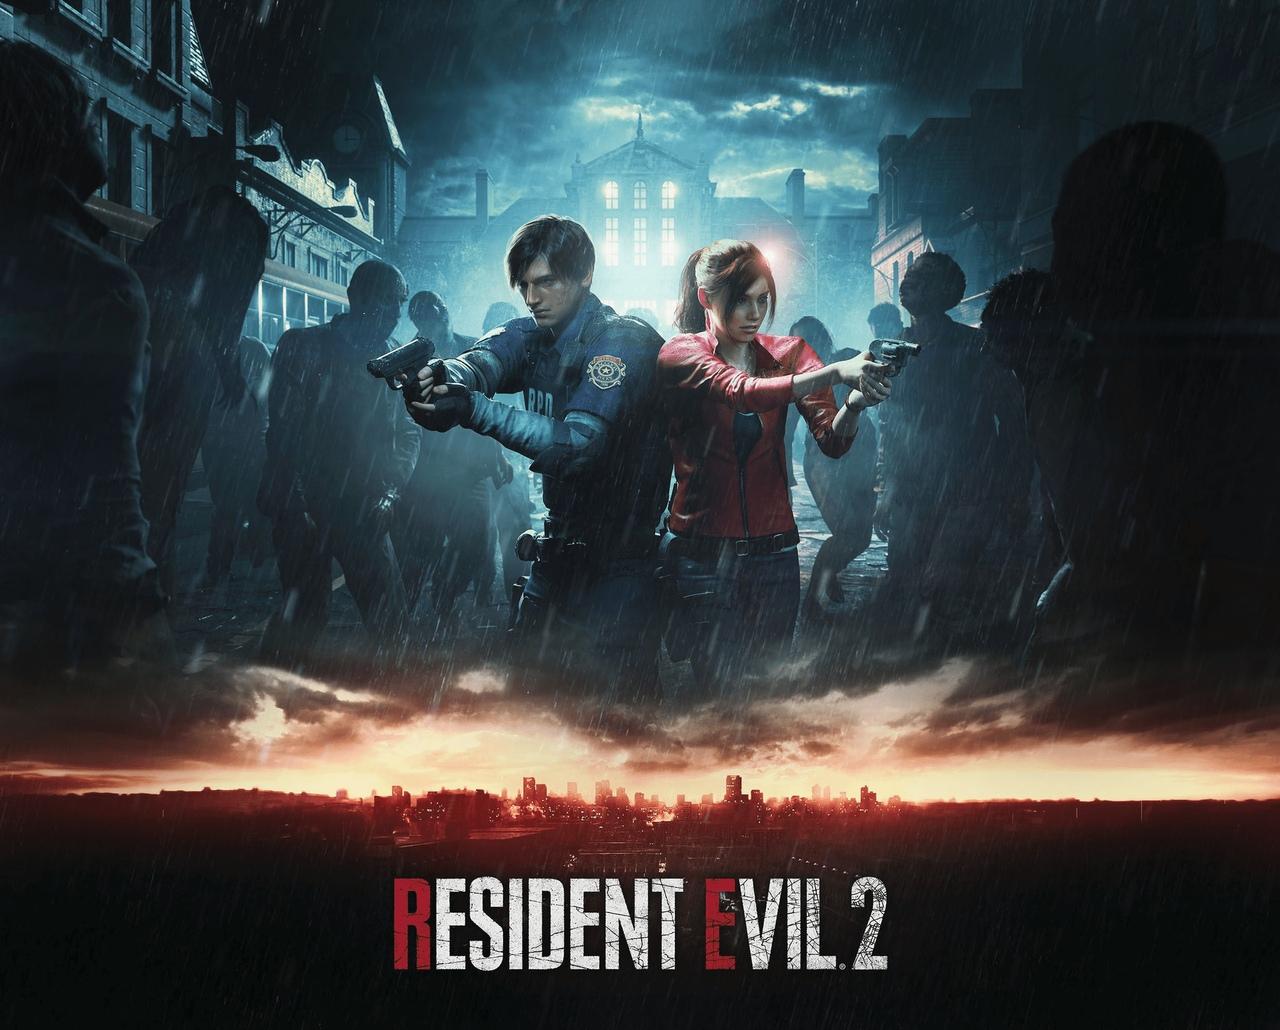 UW_YMBwUUtw.jpg - Resident Evil 2